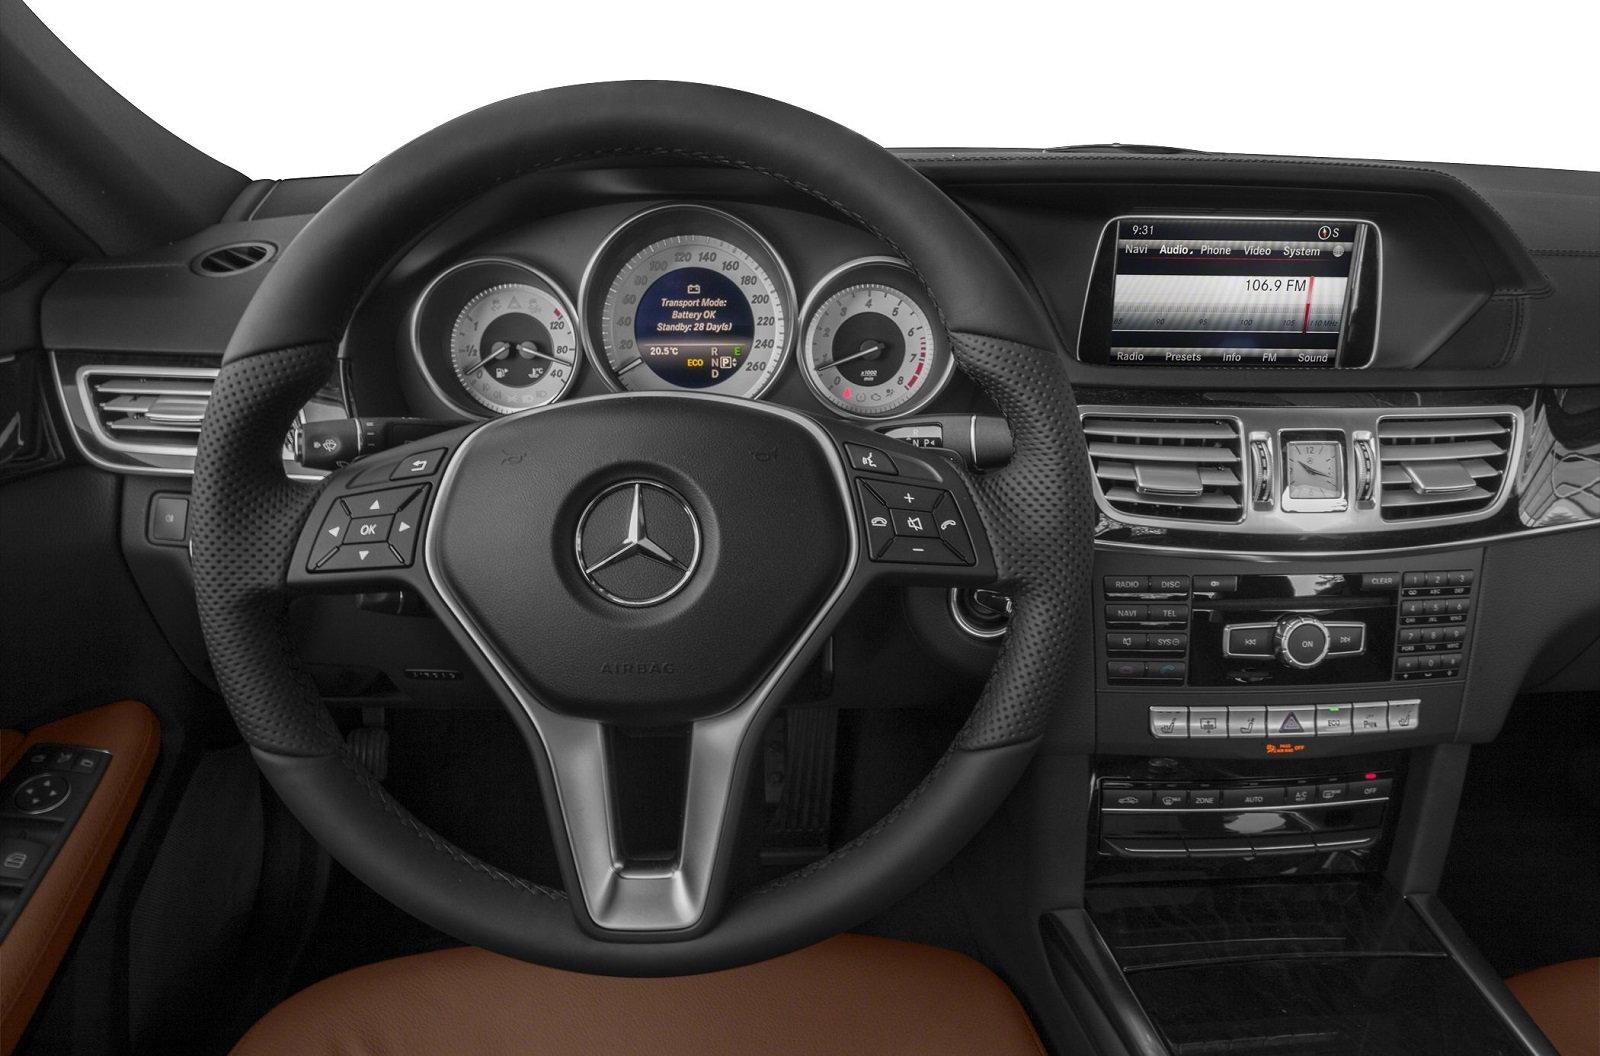 2016 mercedes benz e350 review carsdirect for Mercedes benz e350 interior